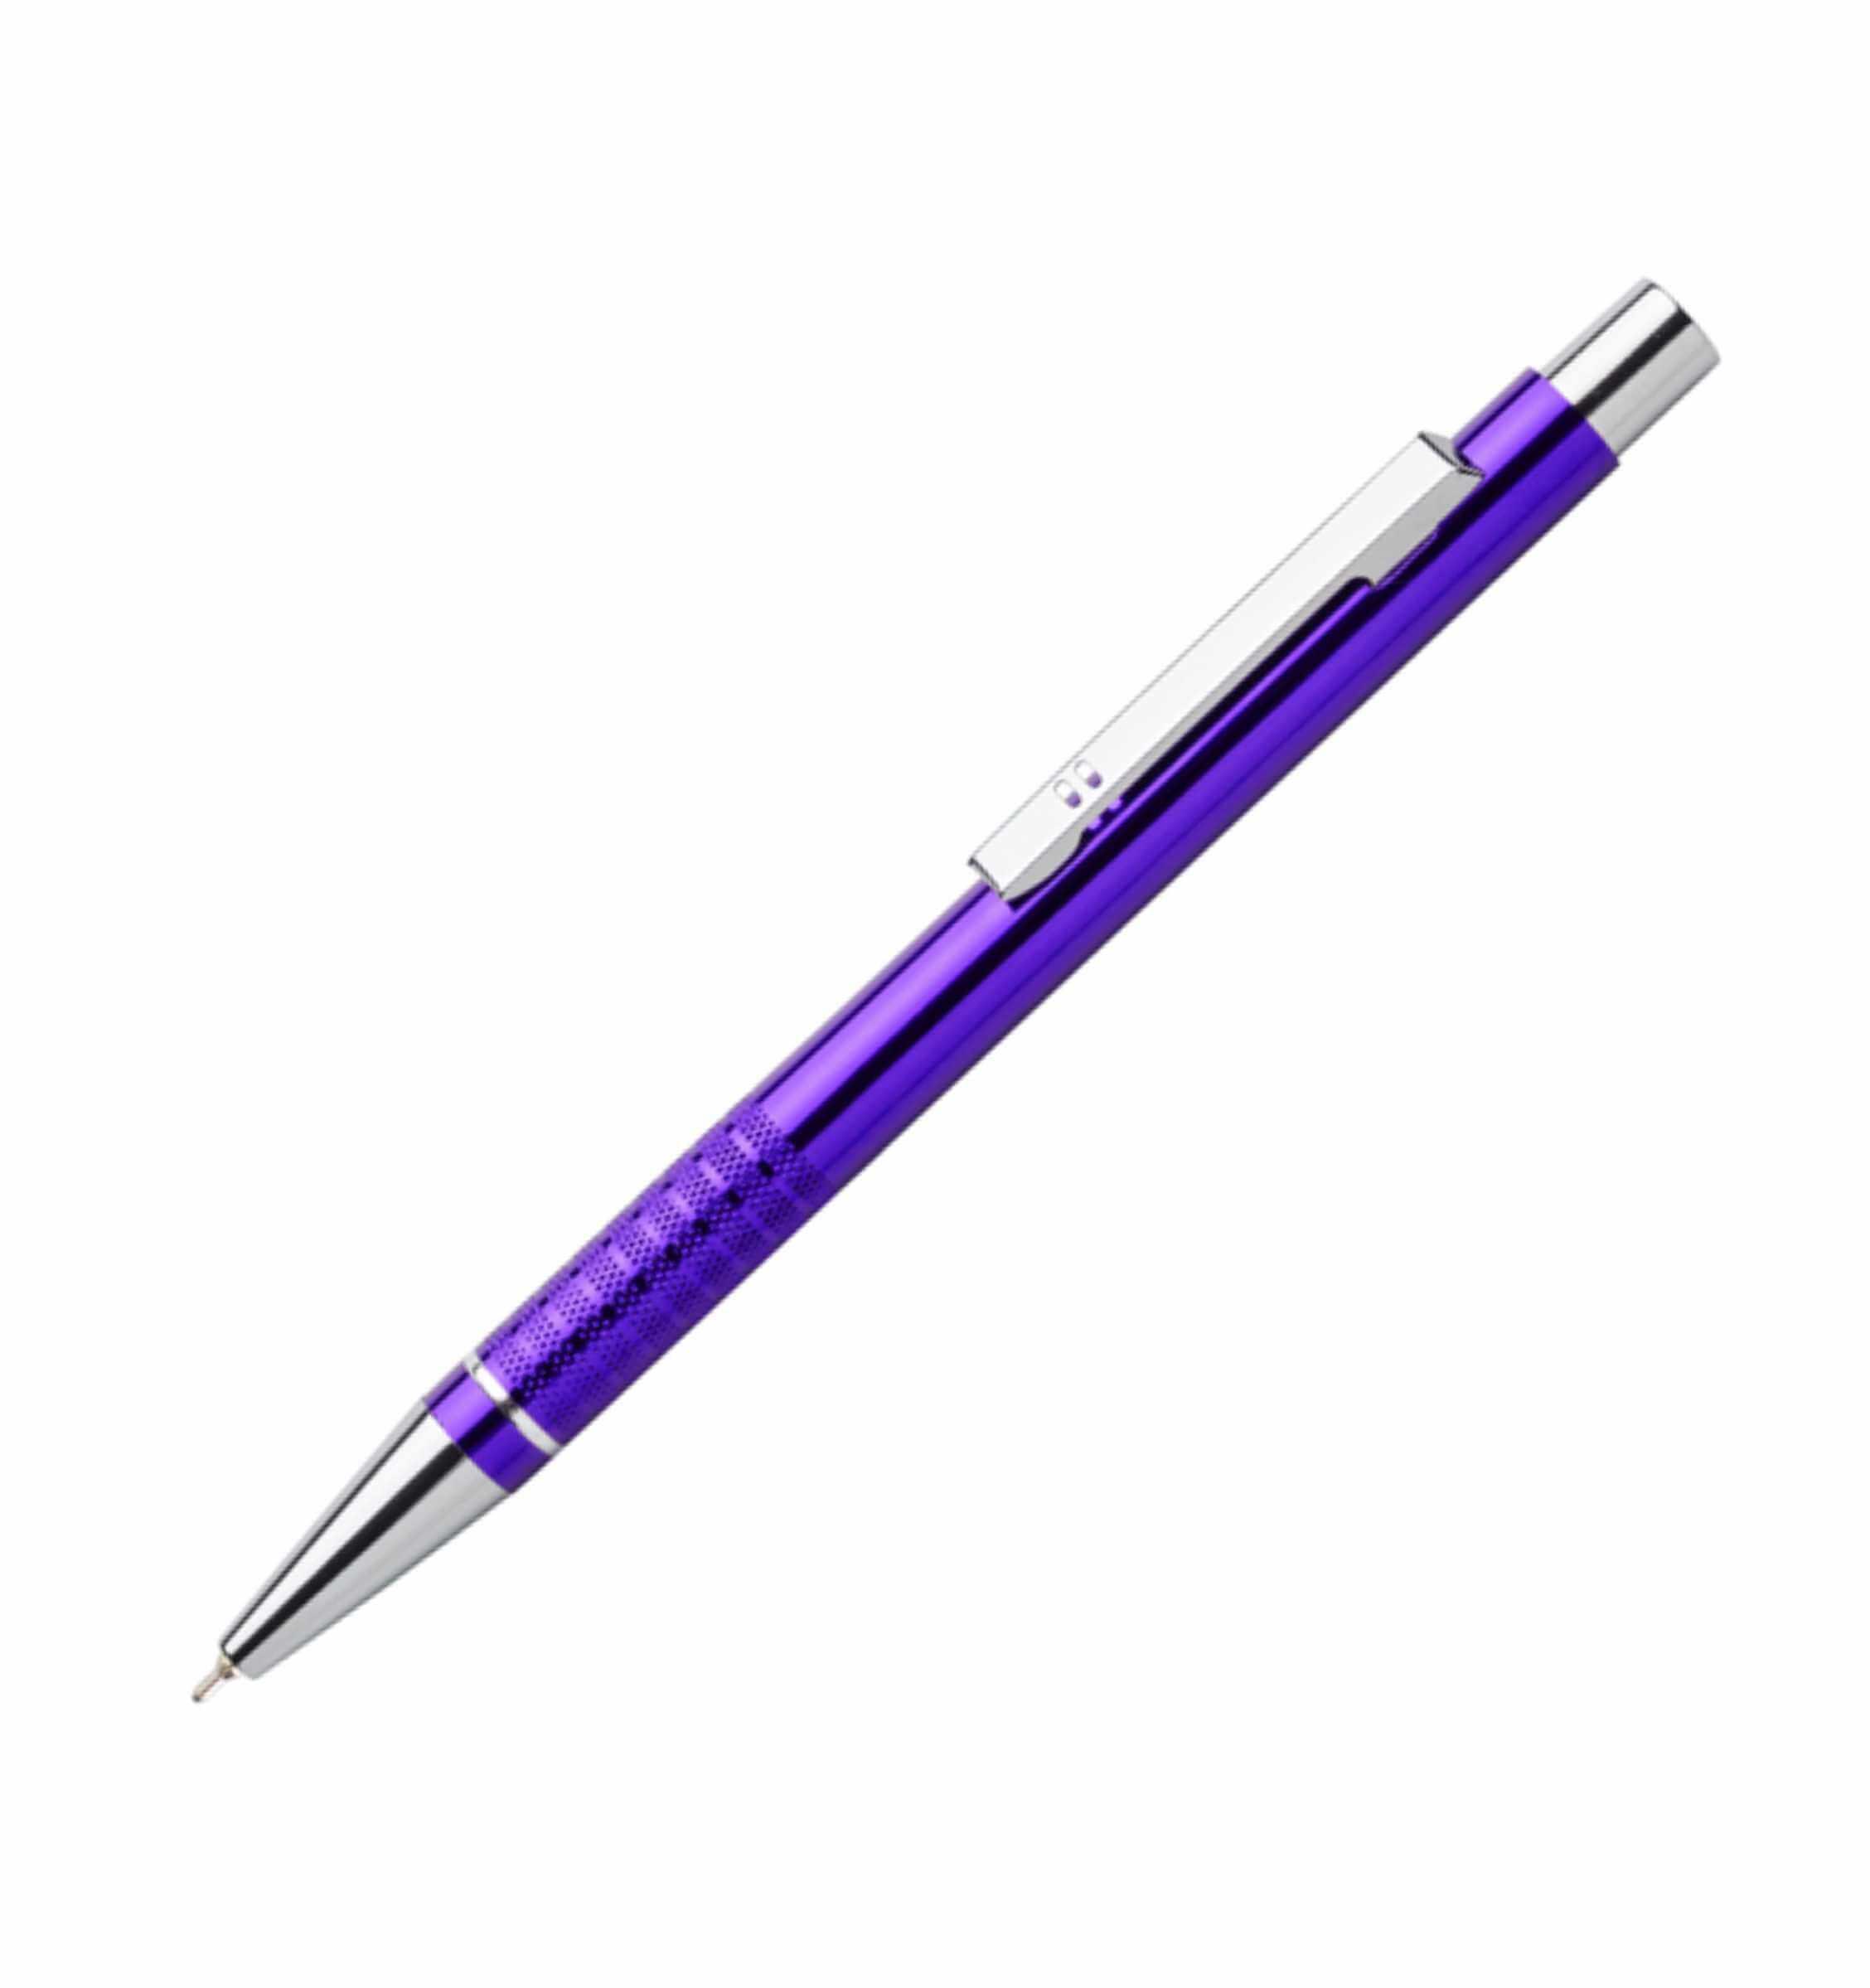 pix metalic bonito violet